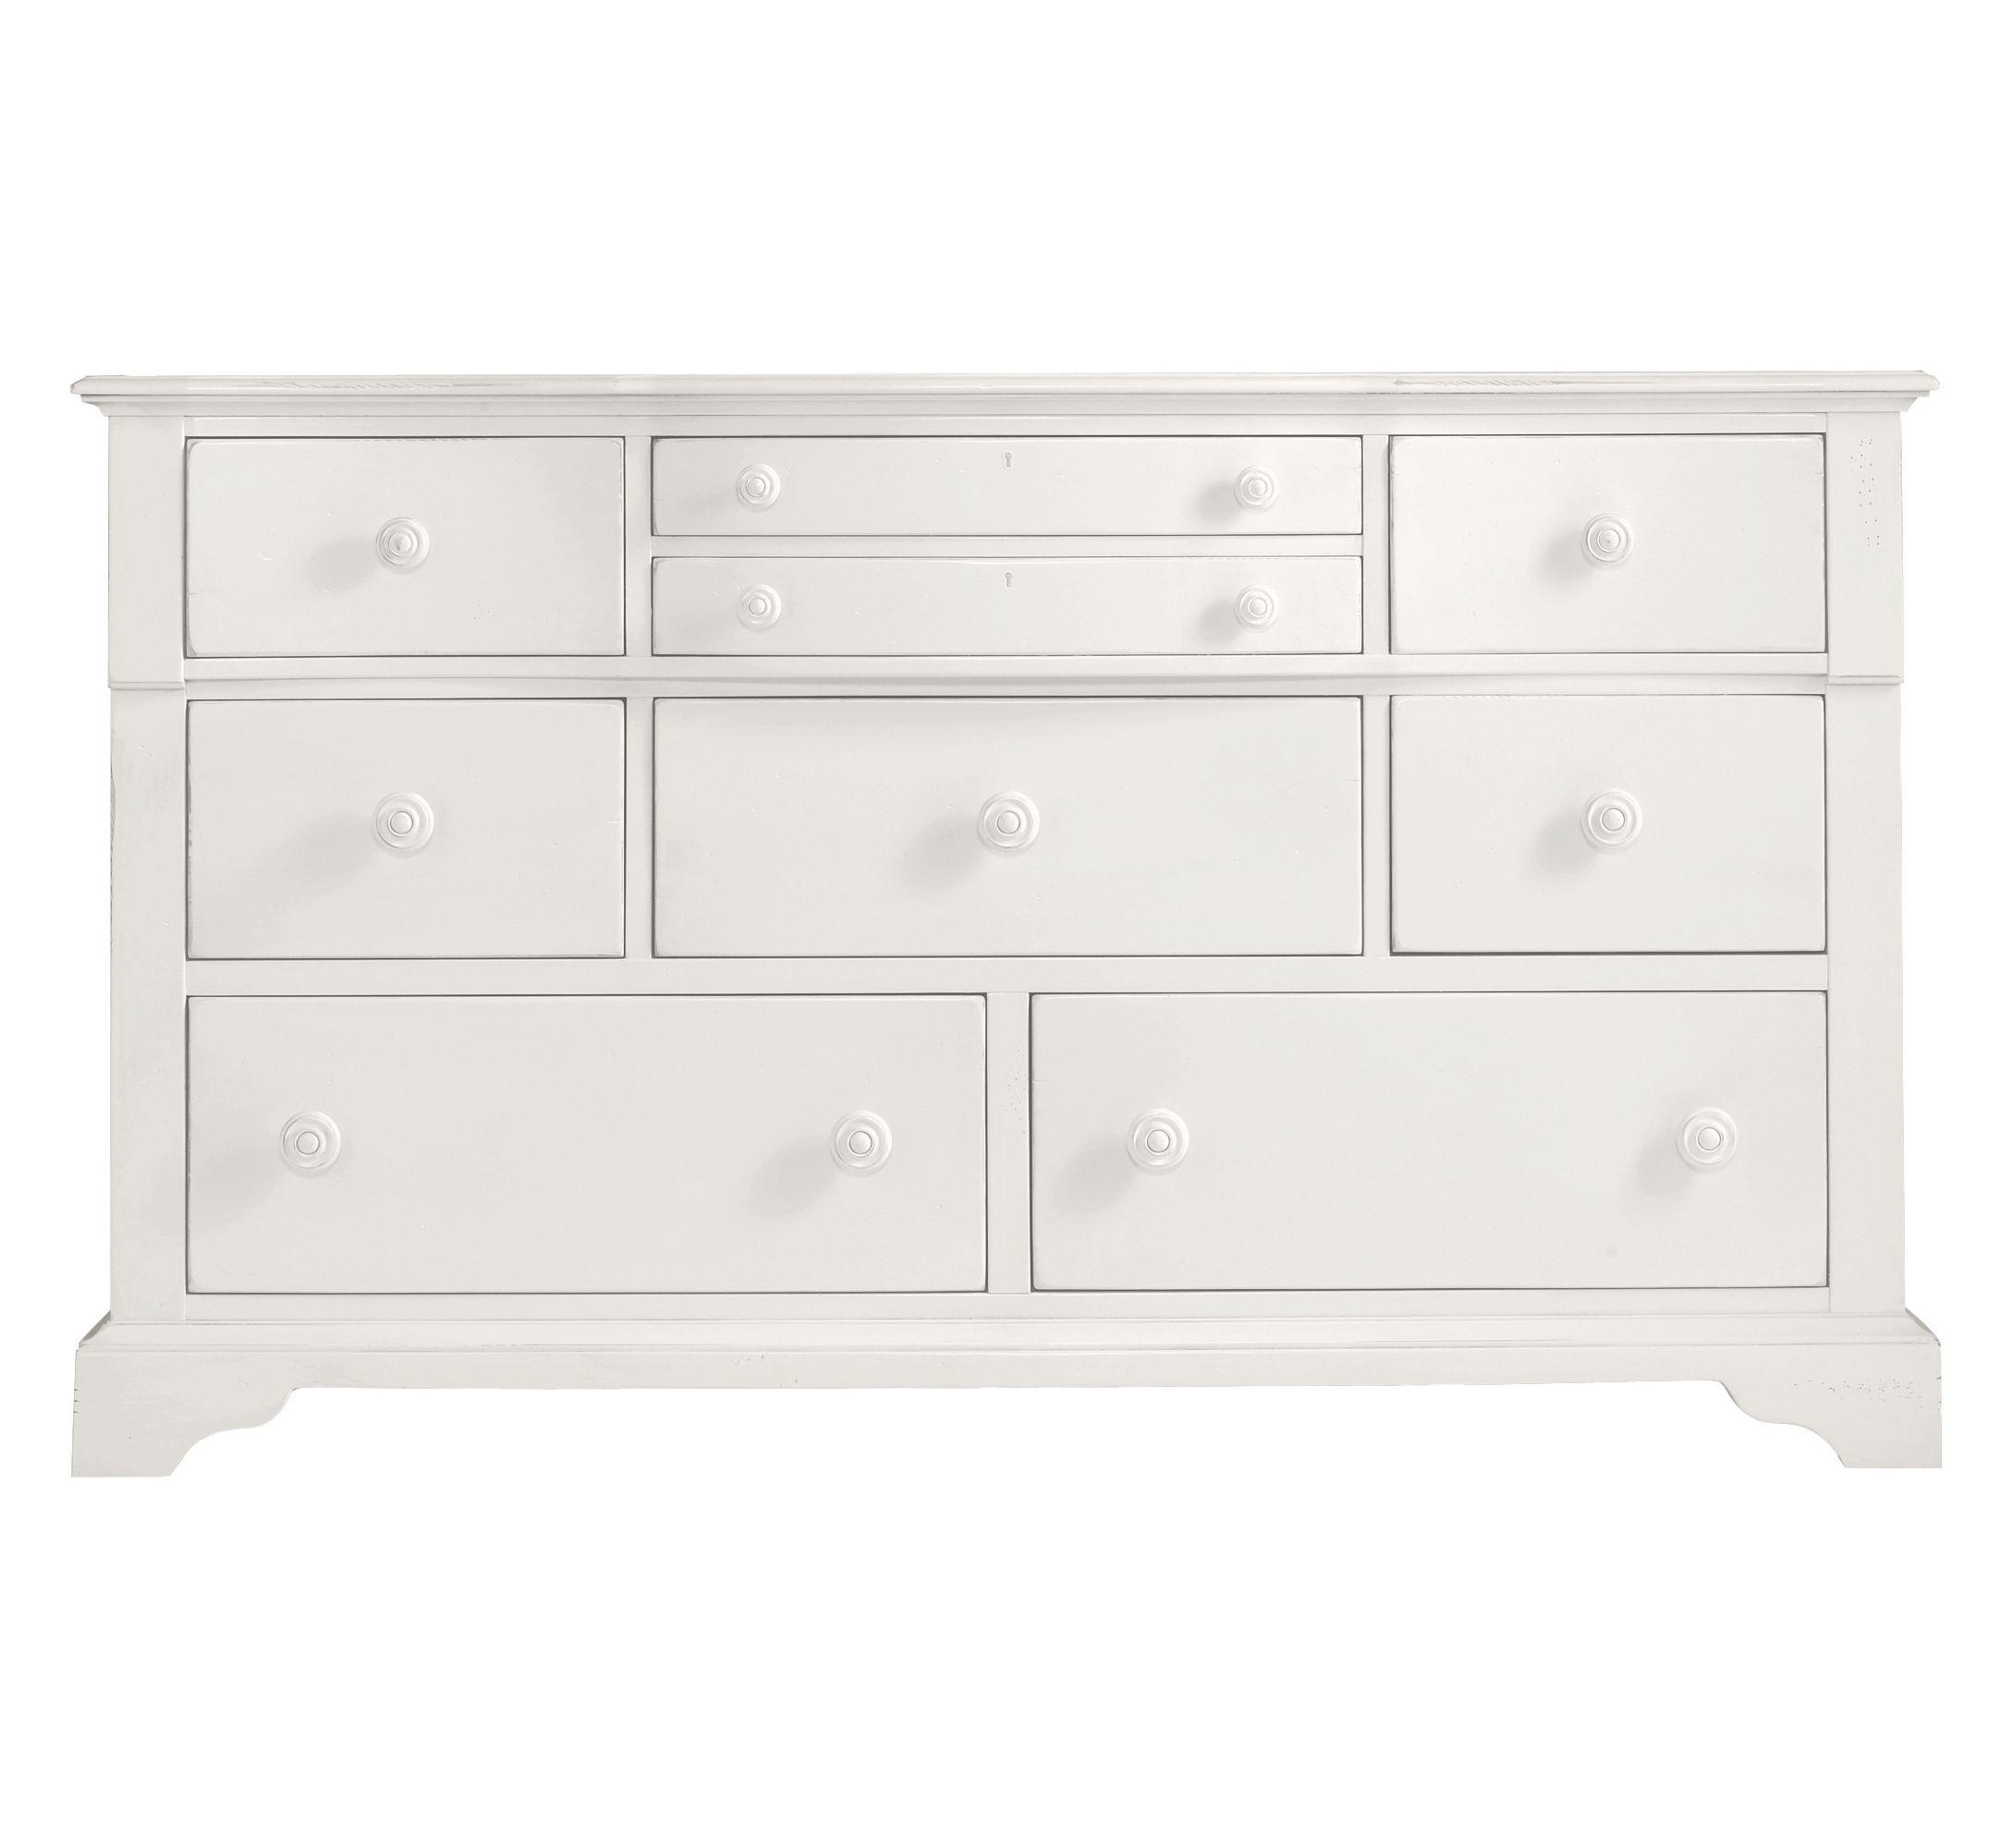 Stanley Furniture Coastal Living Retreat Getaway Dresser - Item Number: 411-23-05